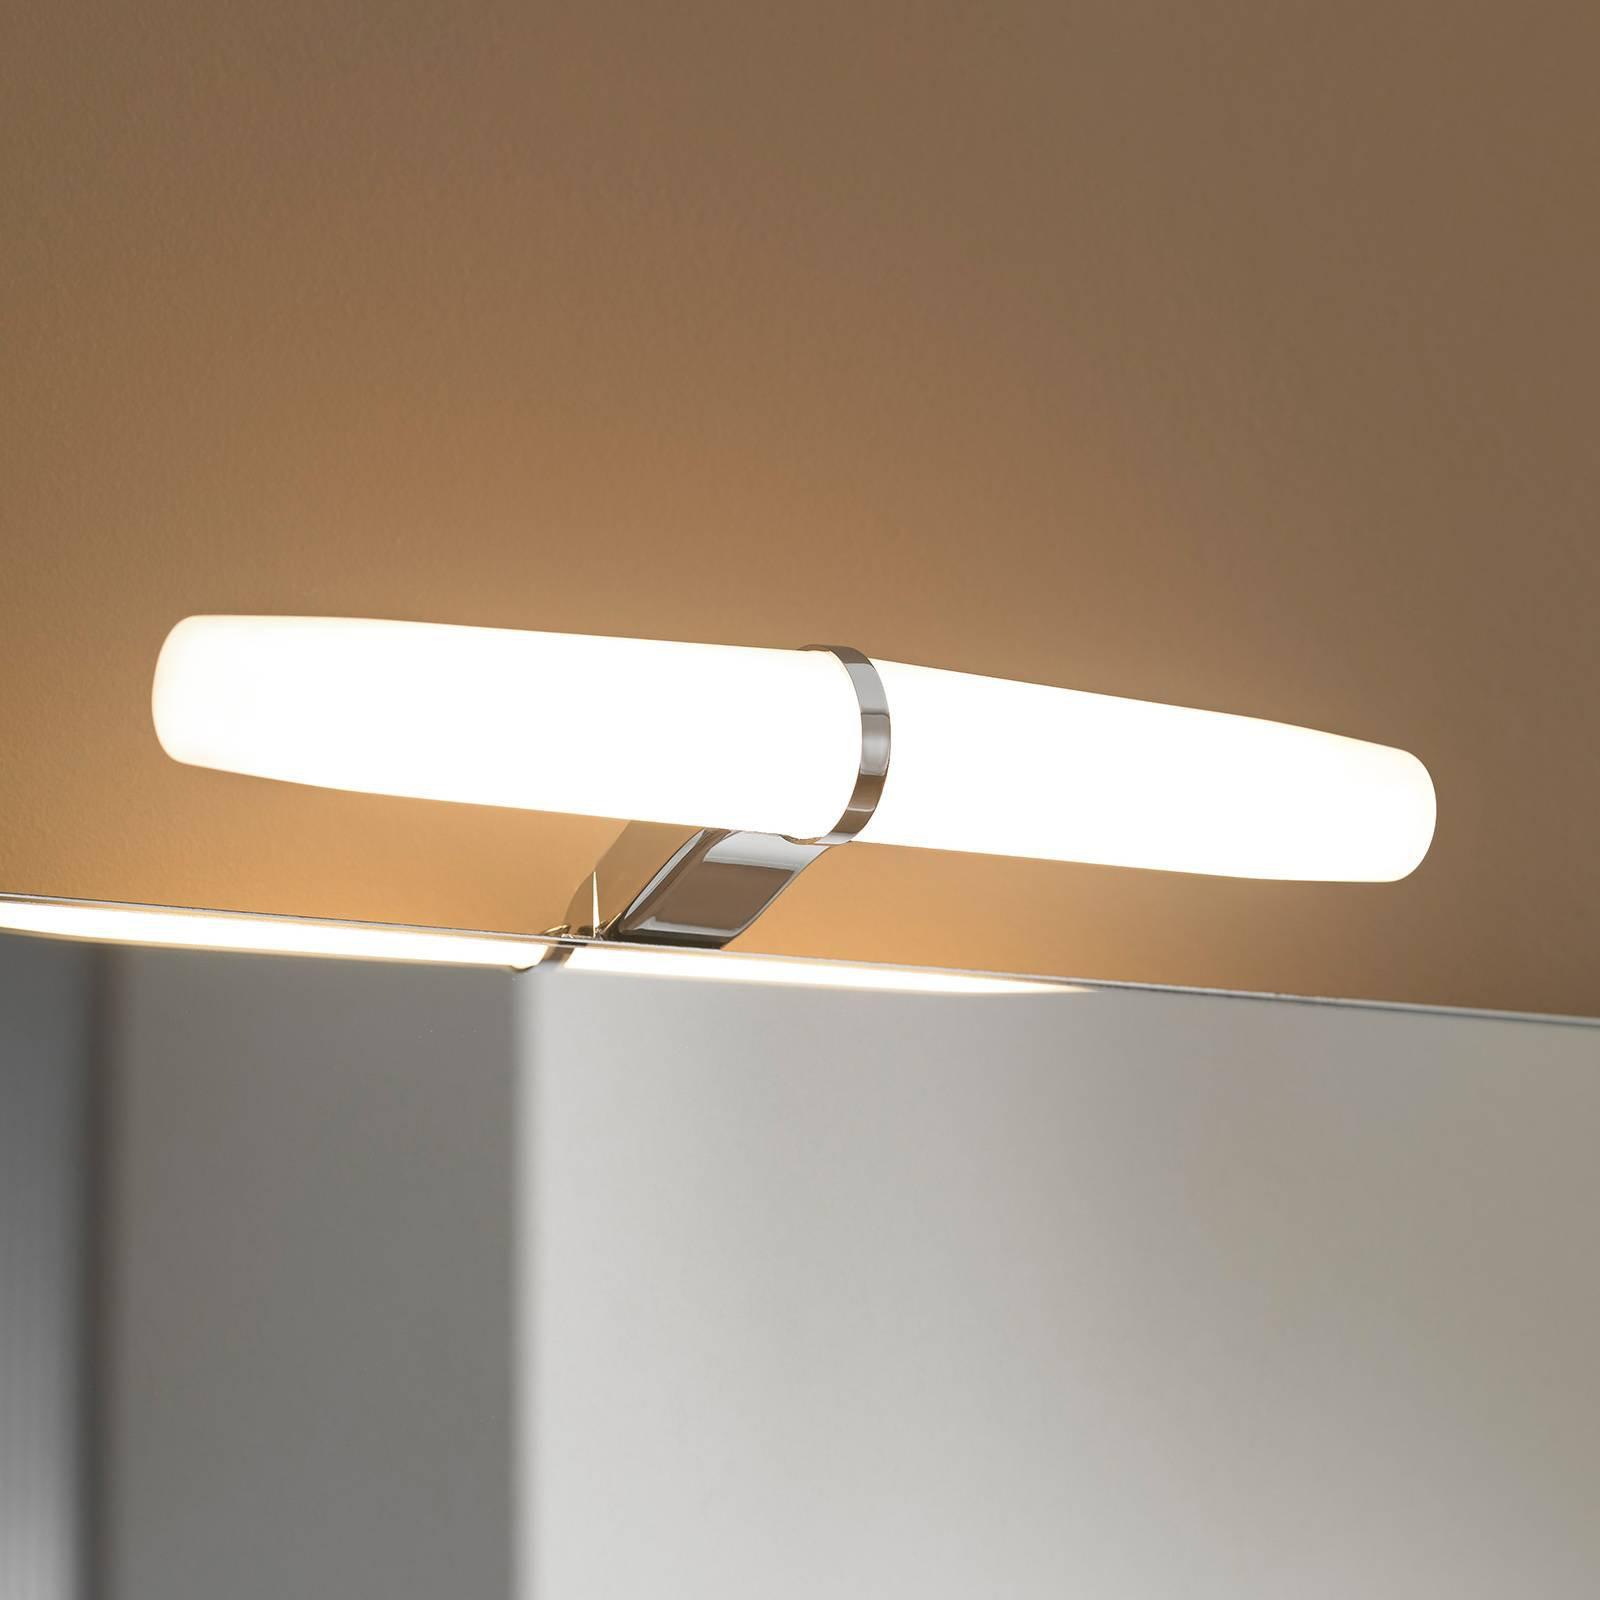 LED-speillampe Eva 2, universalhvit